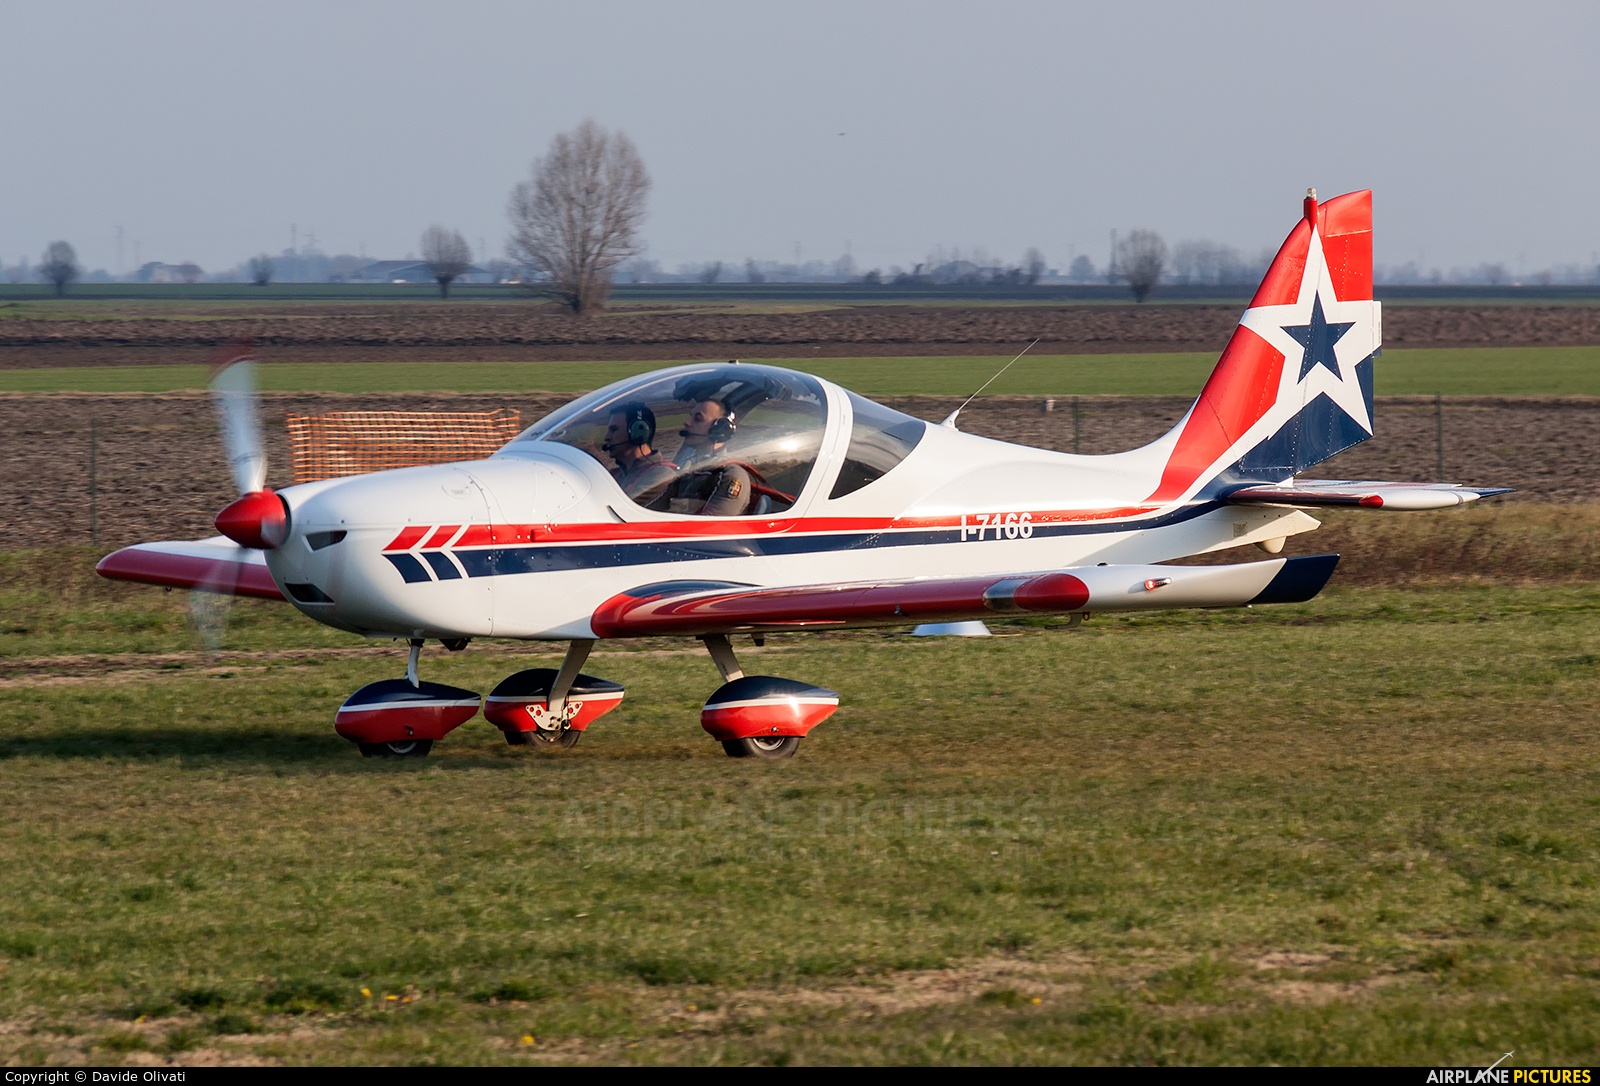 Private I-7166 aircraft at Legnago